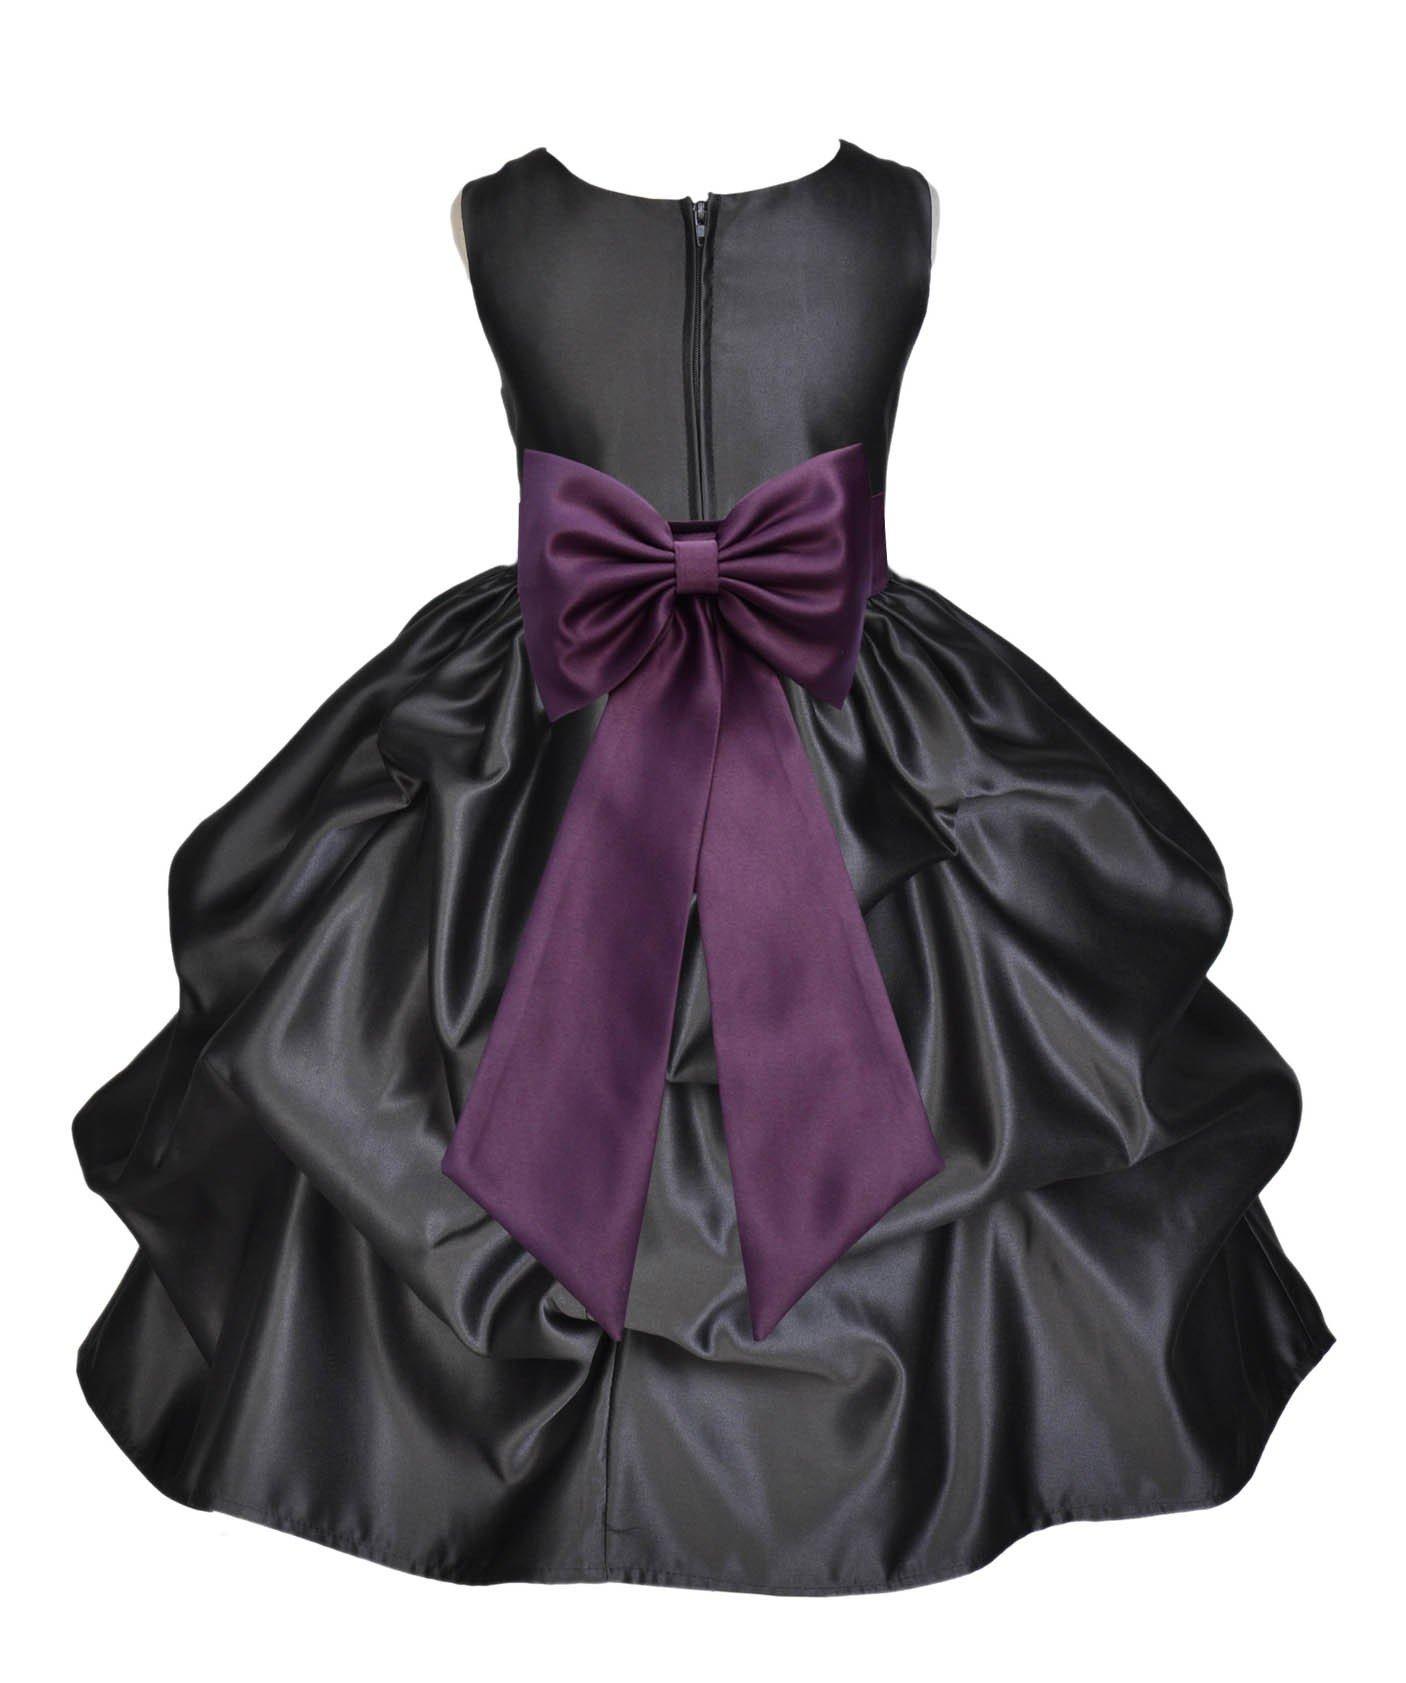 ekidsbridal Black Pick-Up Satin Bubble Flower Girl Dress Ballroom Dance Dresses 208T 2 by ekidsbridal (Image #1)